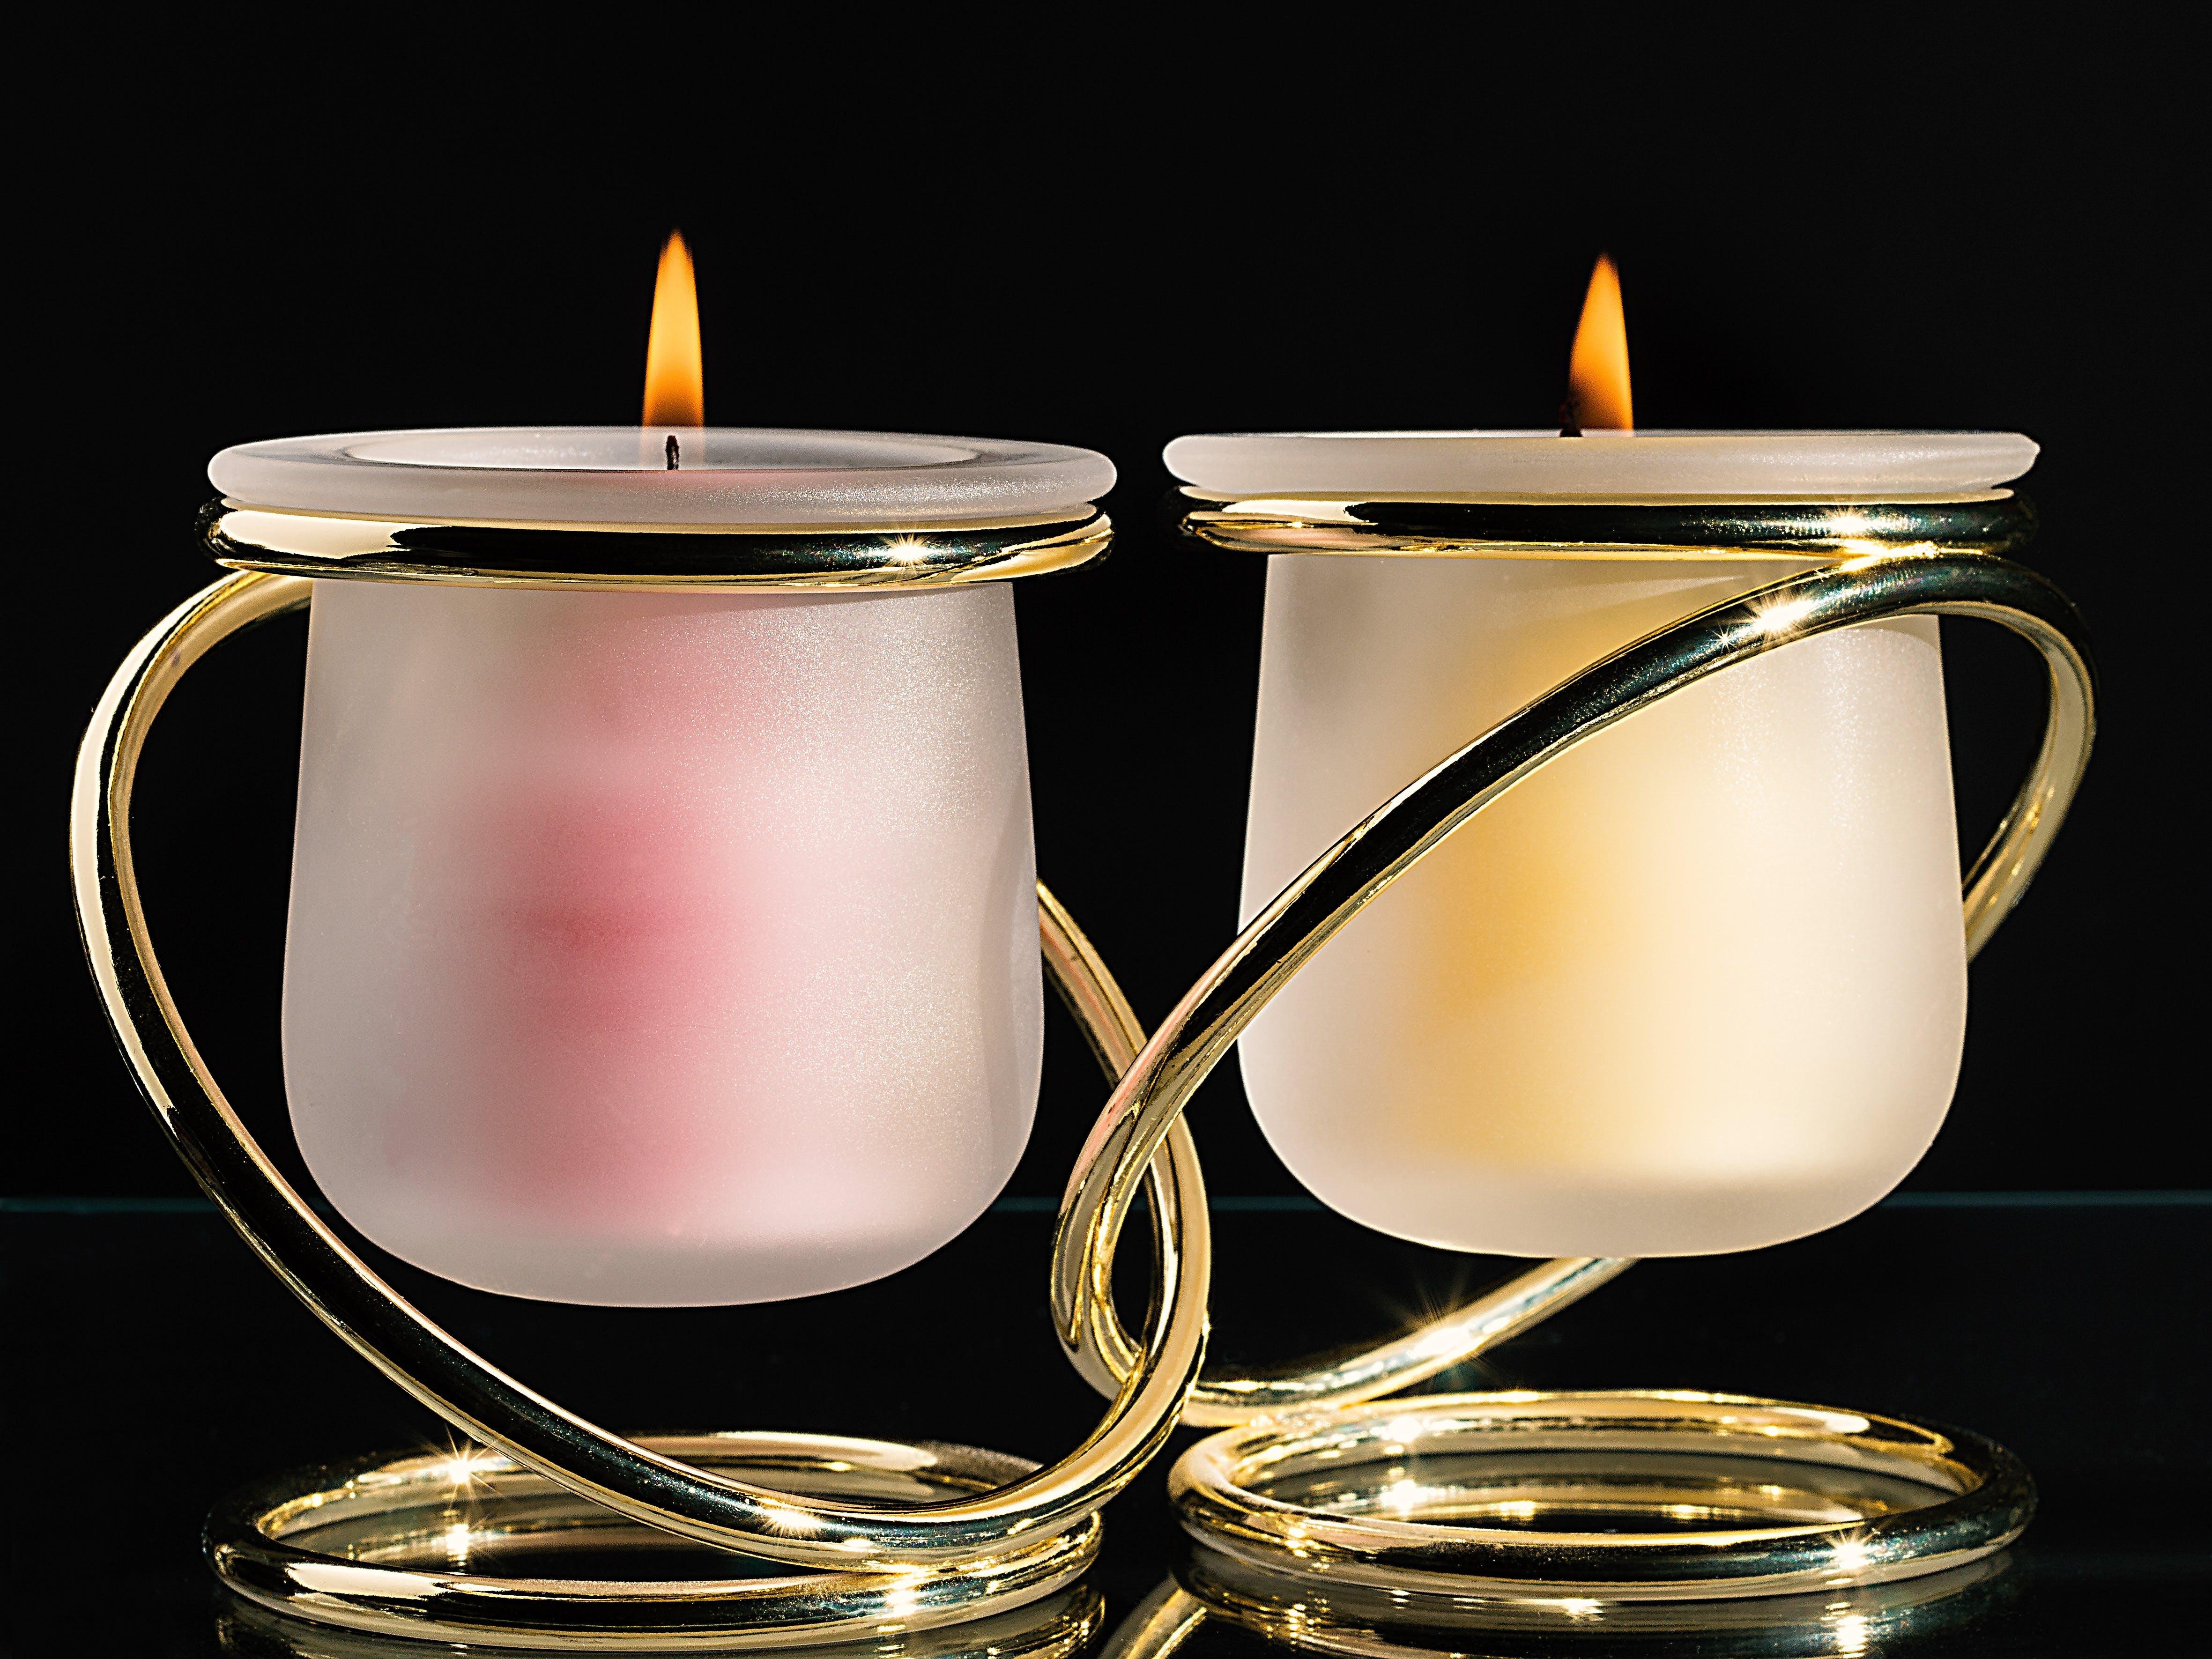 blur, burnt, candle